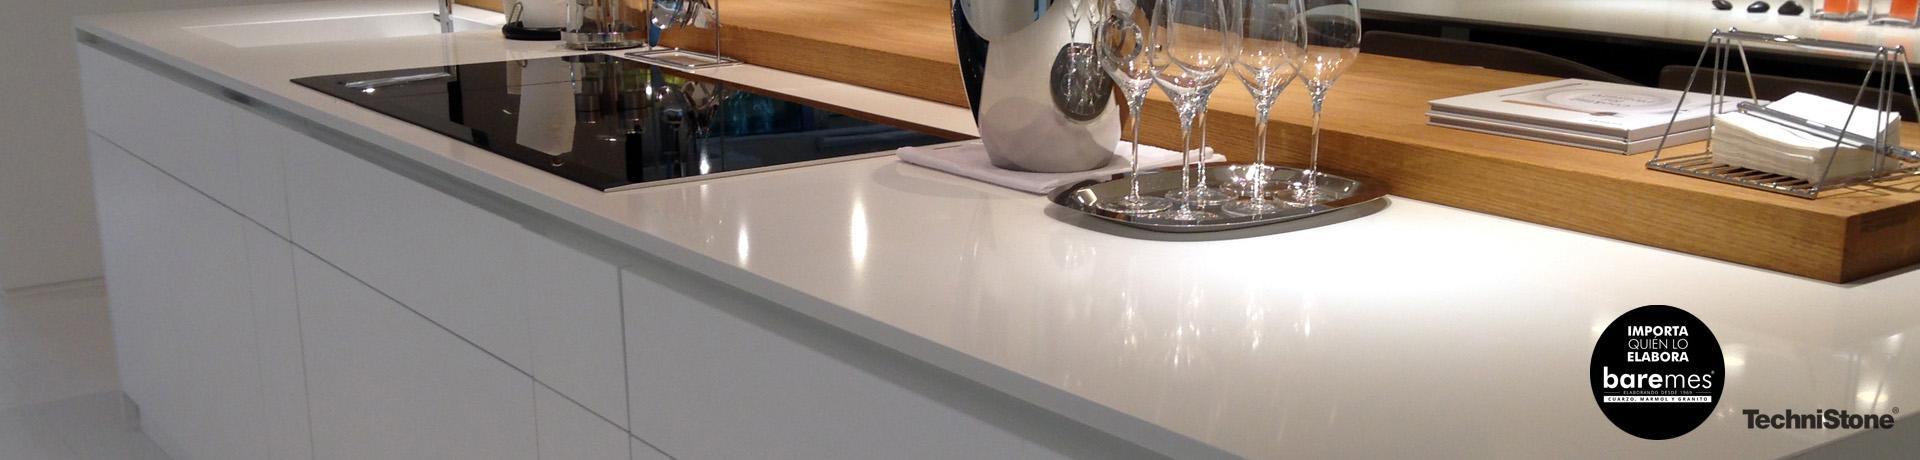 Mesadas de cocina modernas al precio de un buen granito for Material granito para cocina